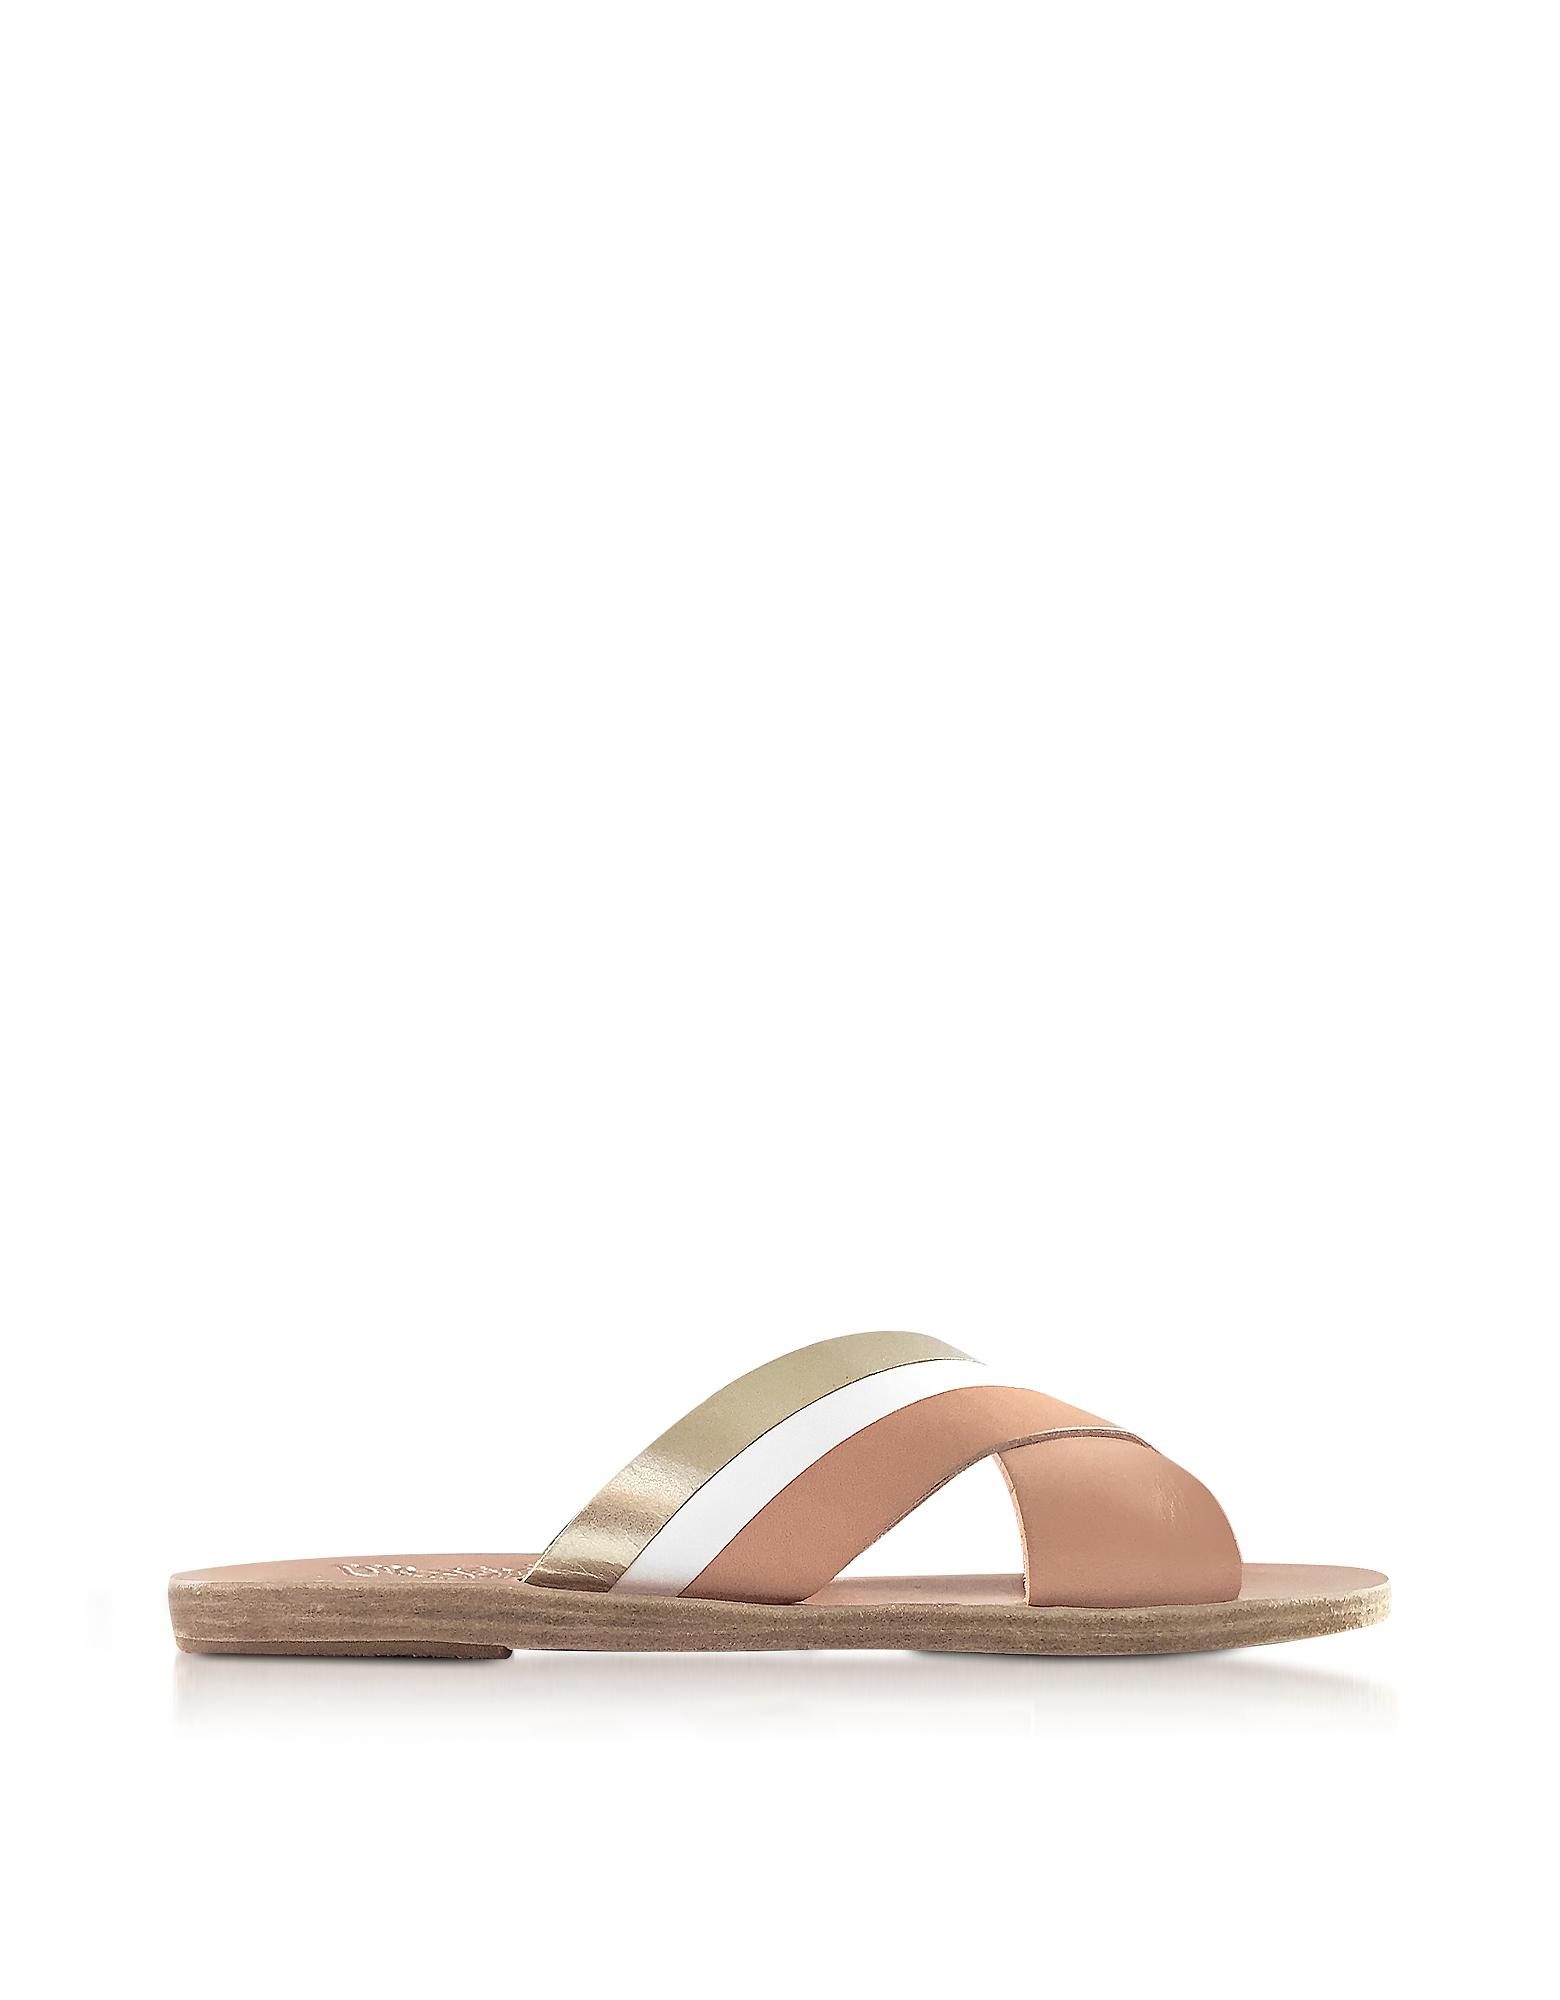 Image of Ancient Greek Sandals Designer Shoes, Thais Platinum, White and Natural Leather Flat Slide Sandals